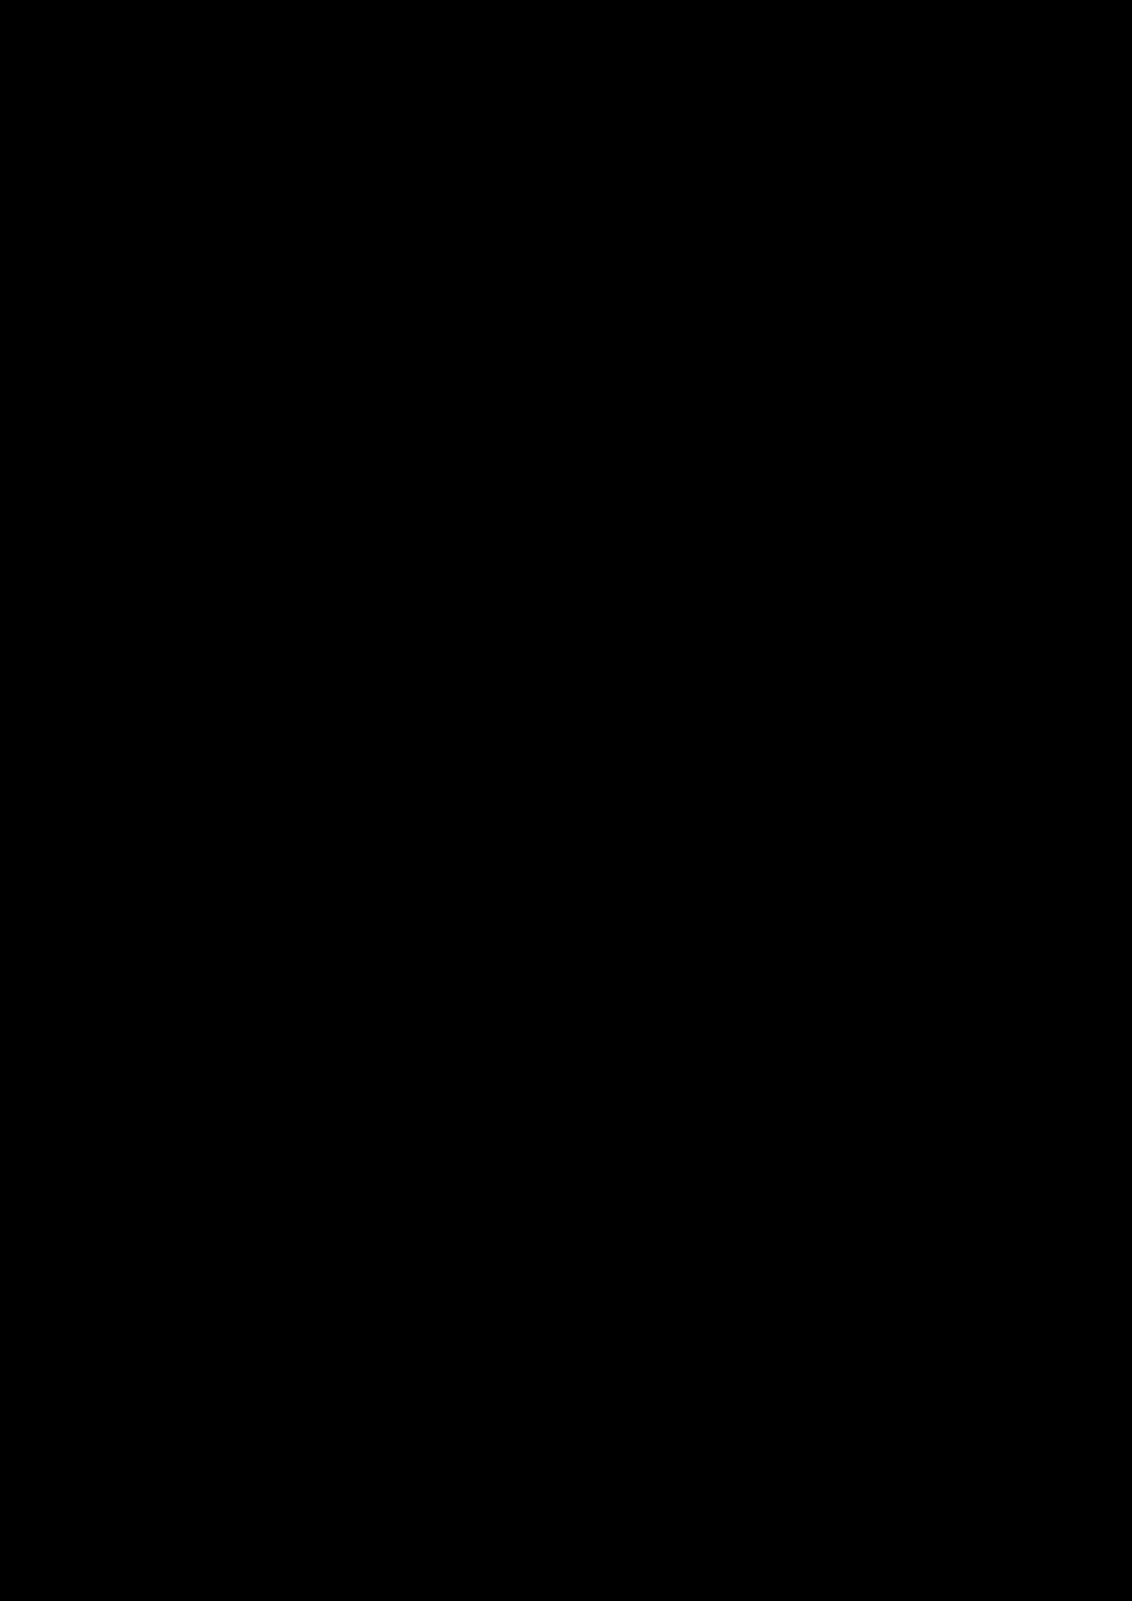 Prosti slide, Image 10